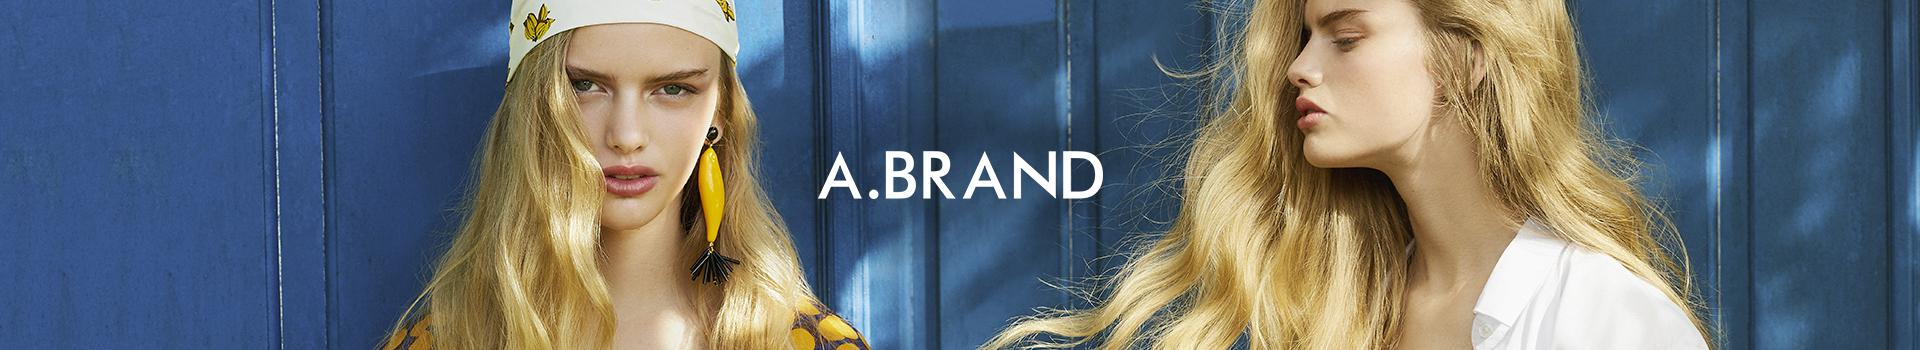 Banner A.Brand